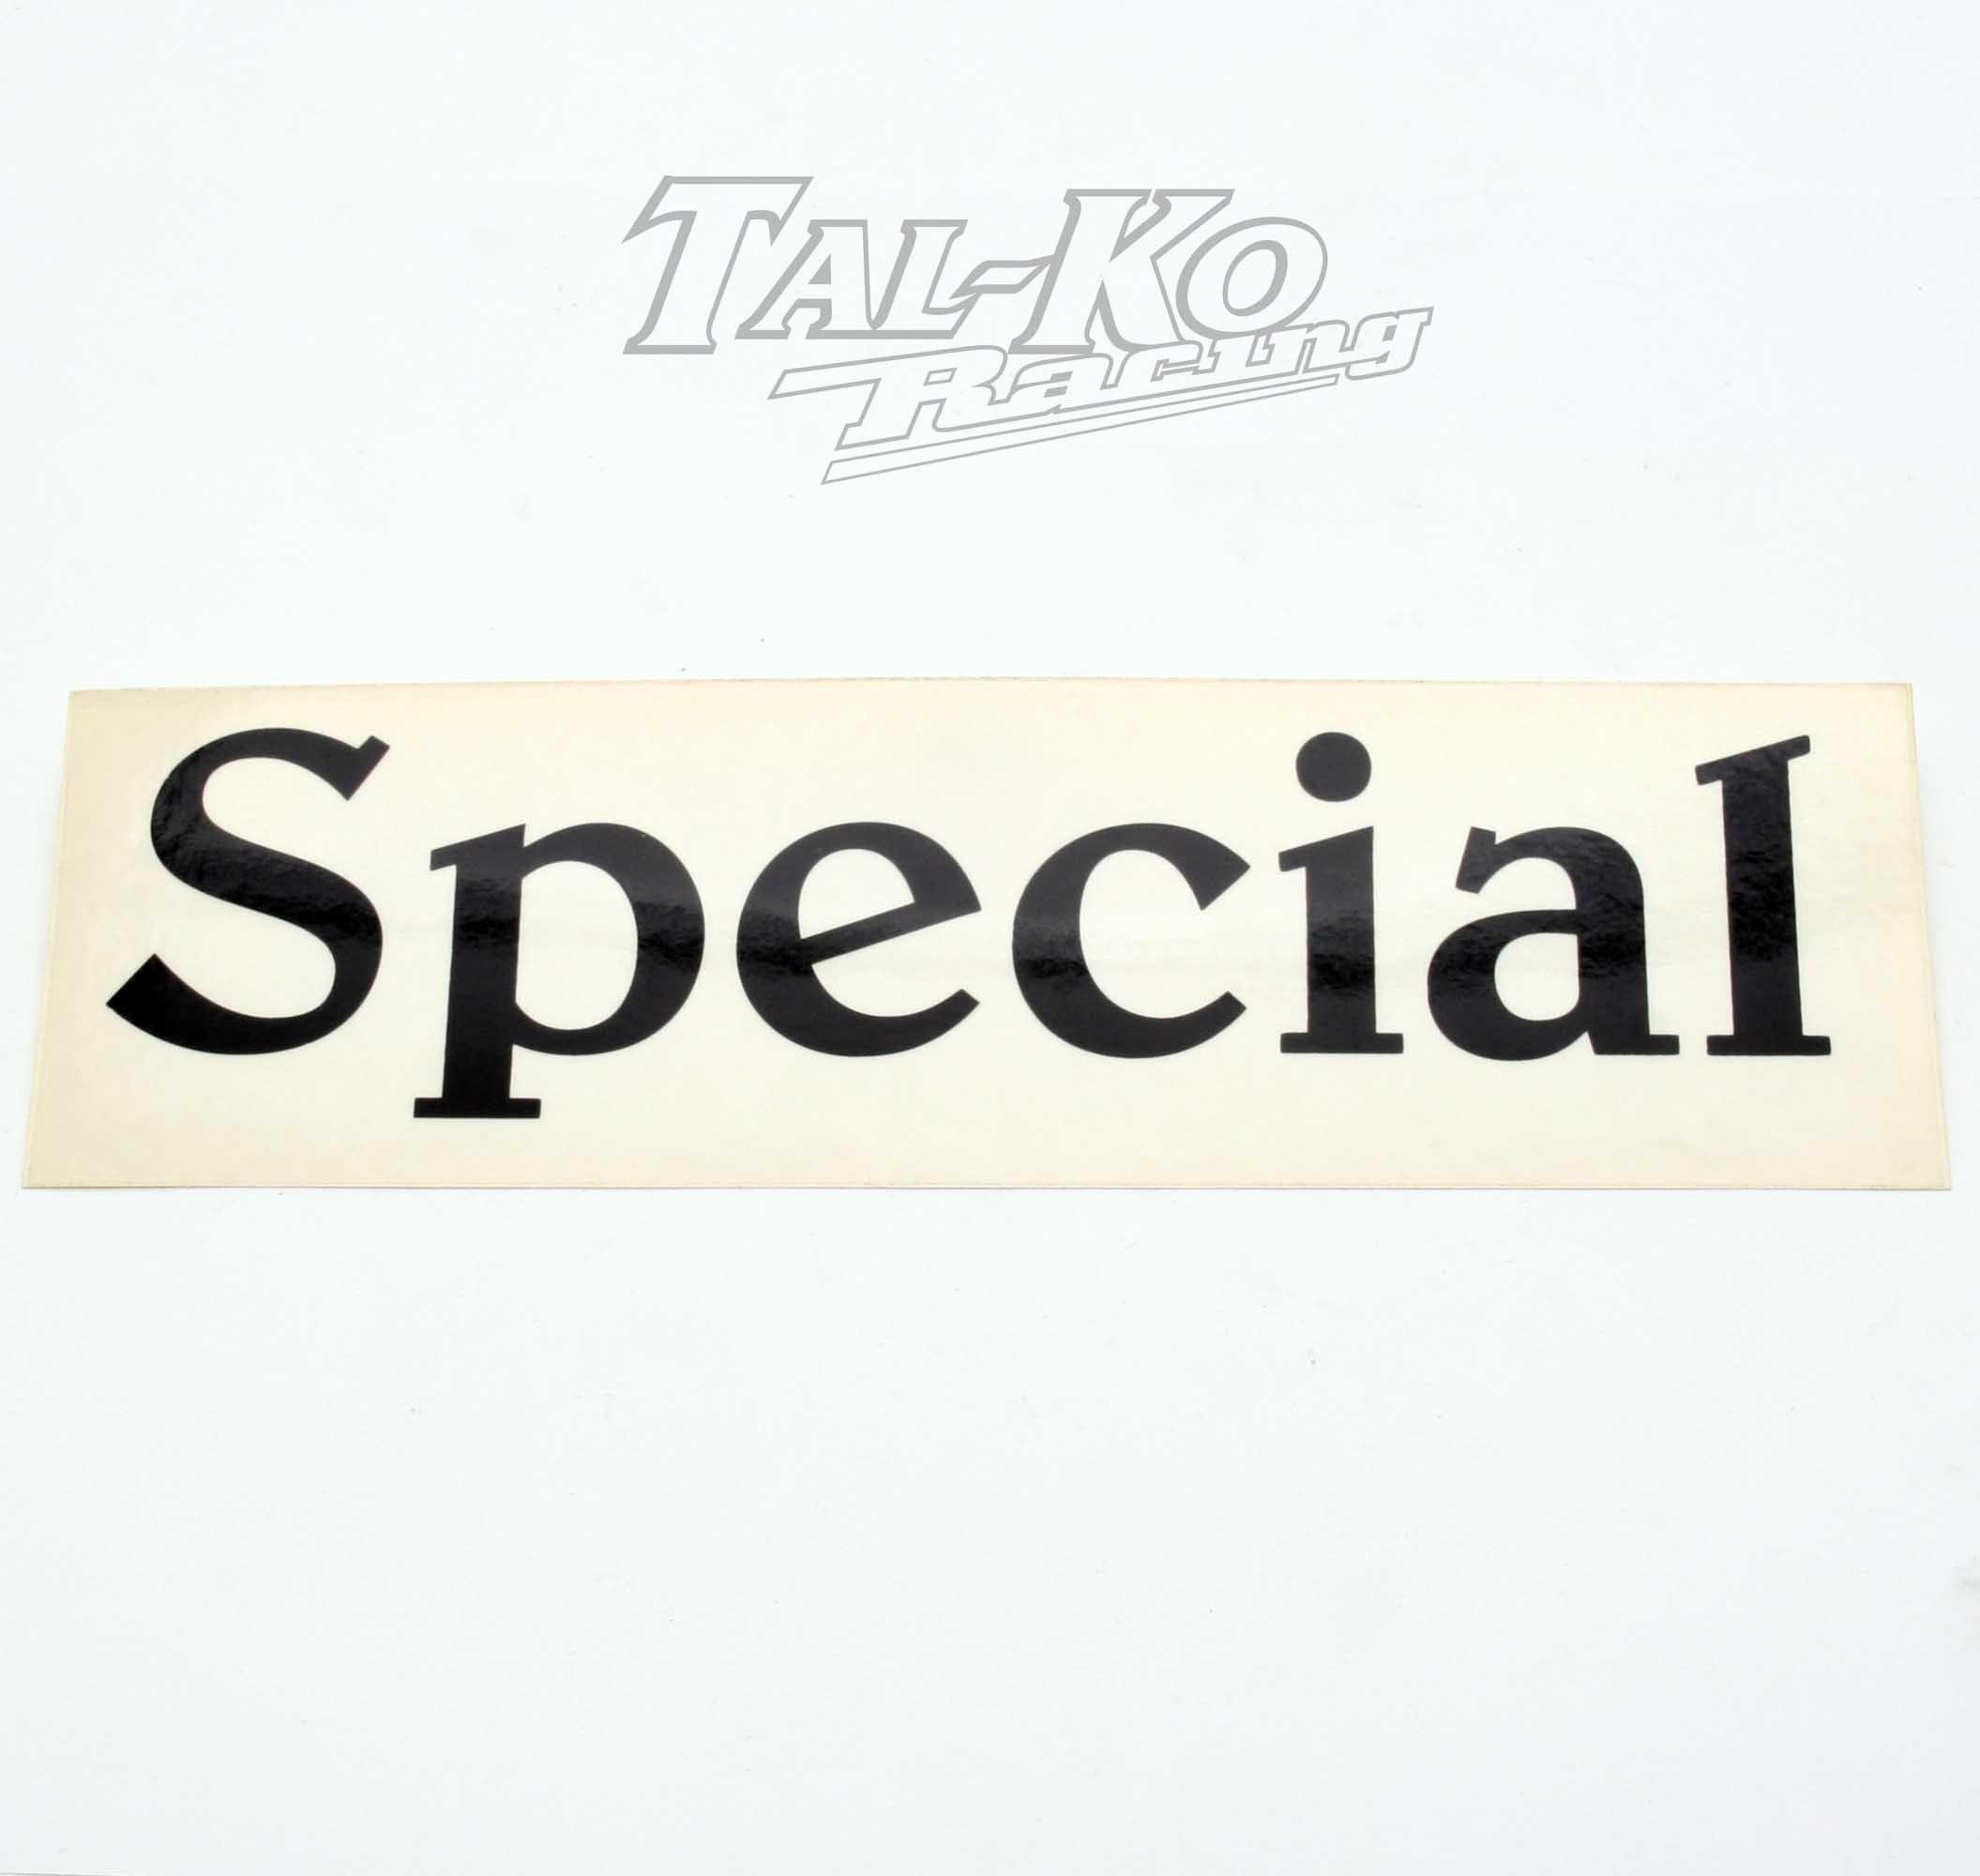 CRG SPECIAL STICKER DECAL 250 x 75